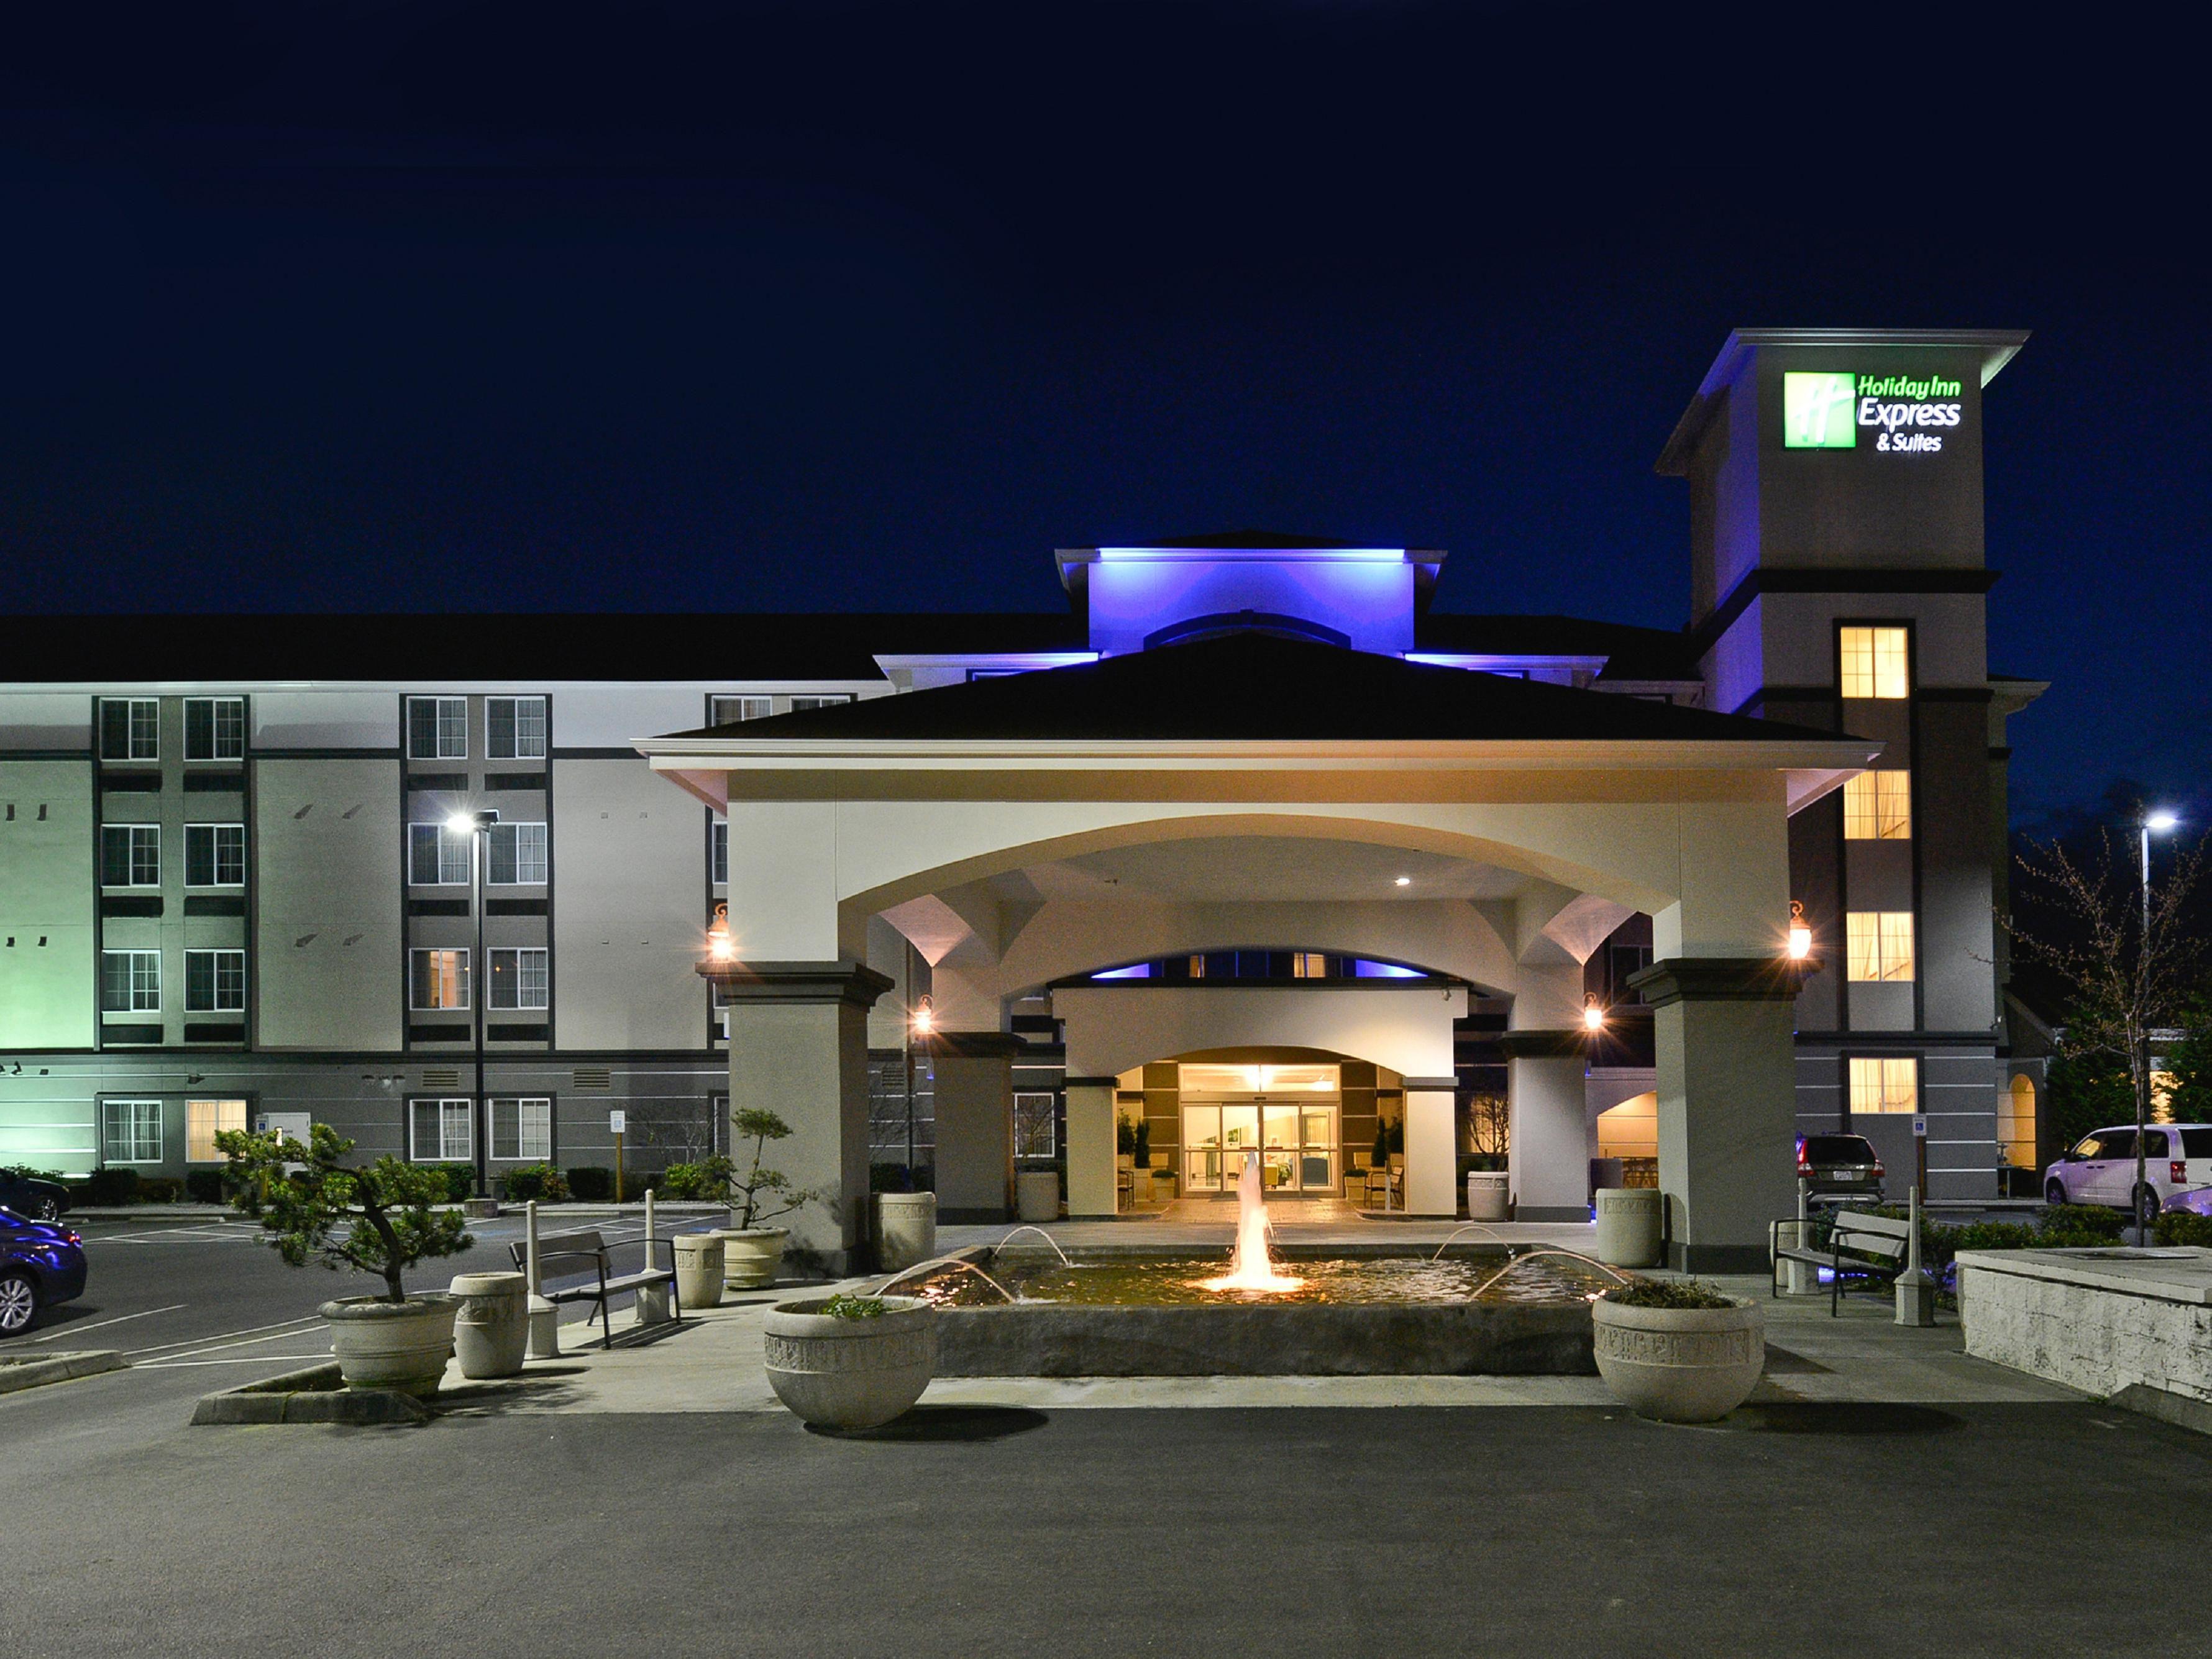 Holiday Inn Express Suites Tacoma South Lakewood In Lacey Washington